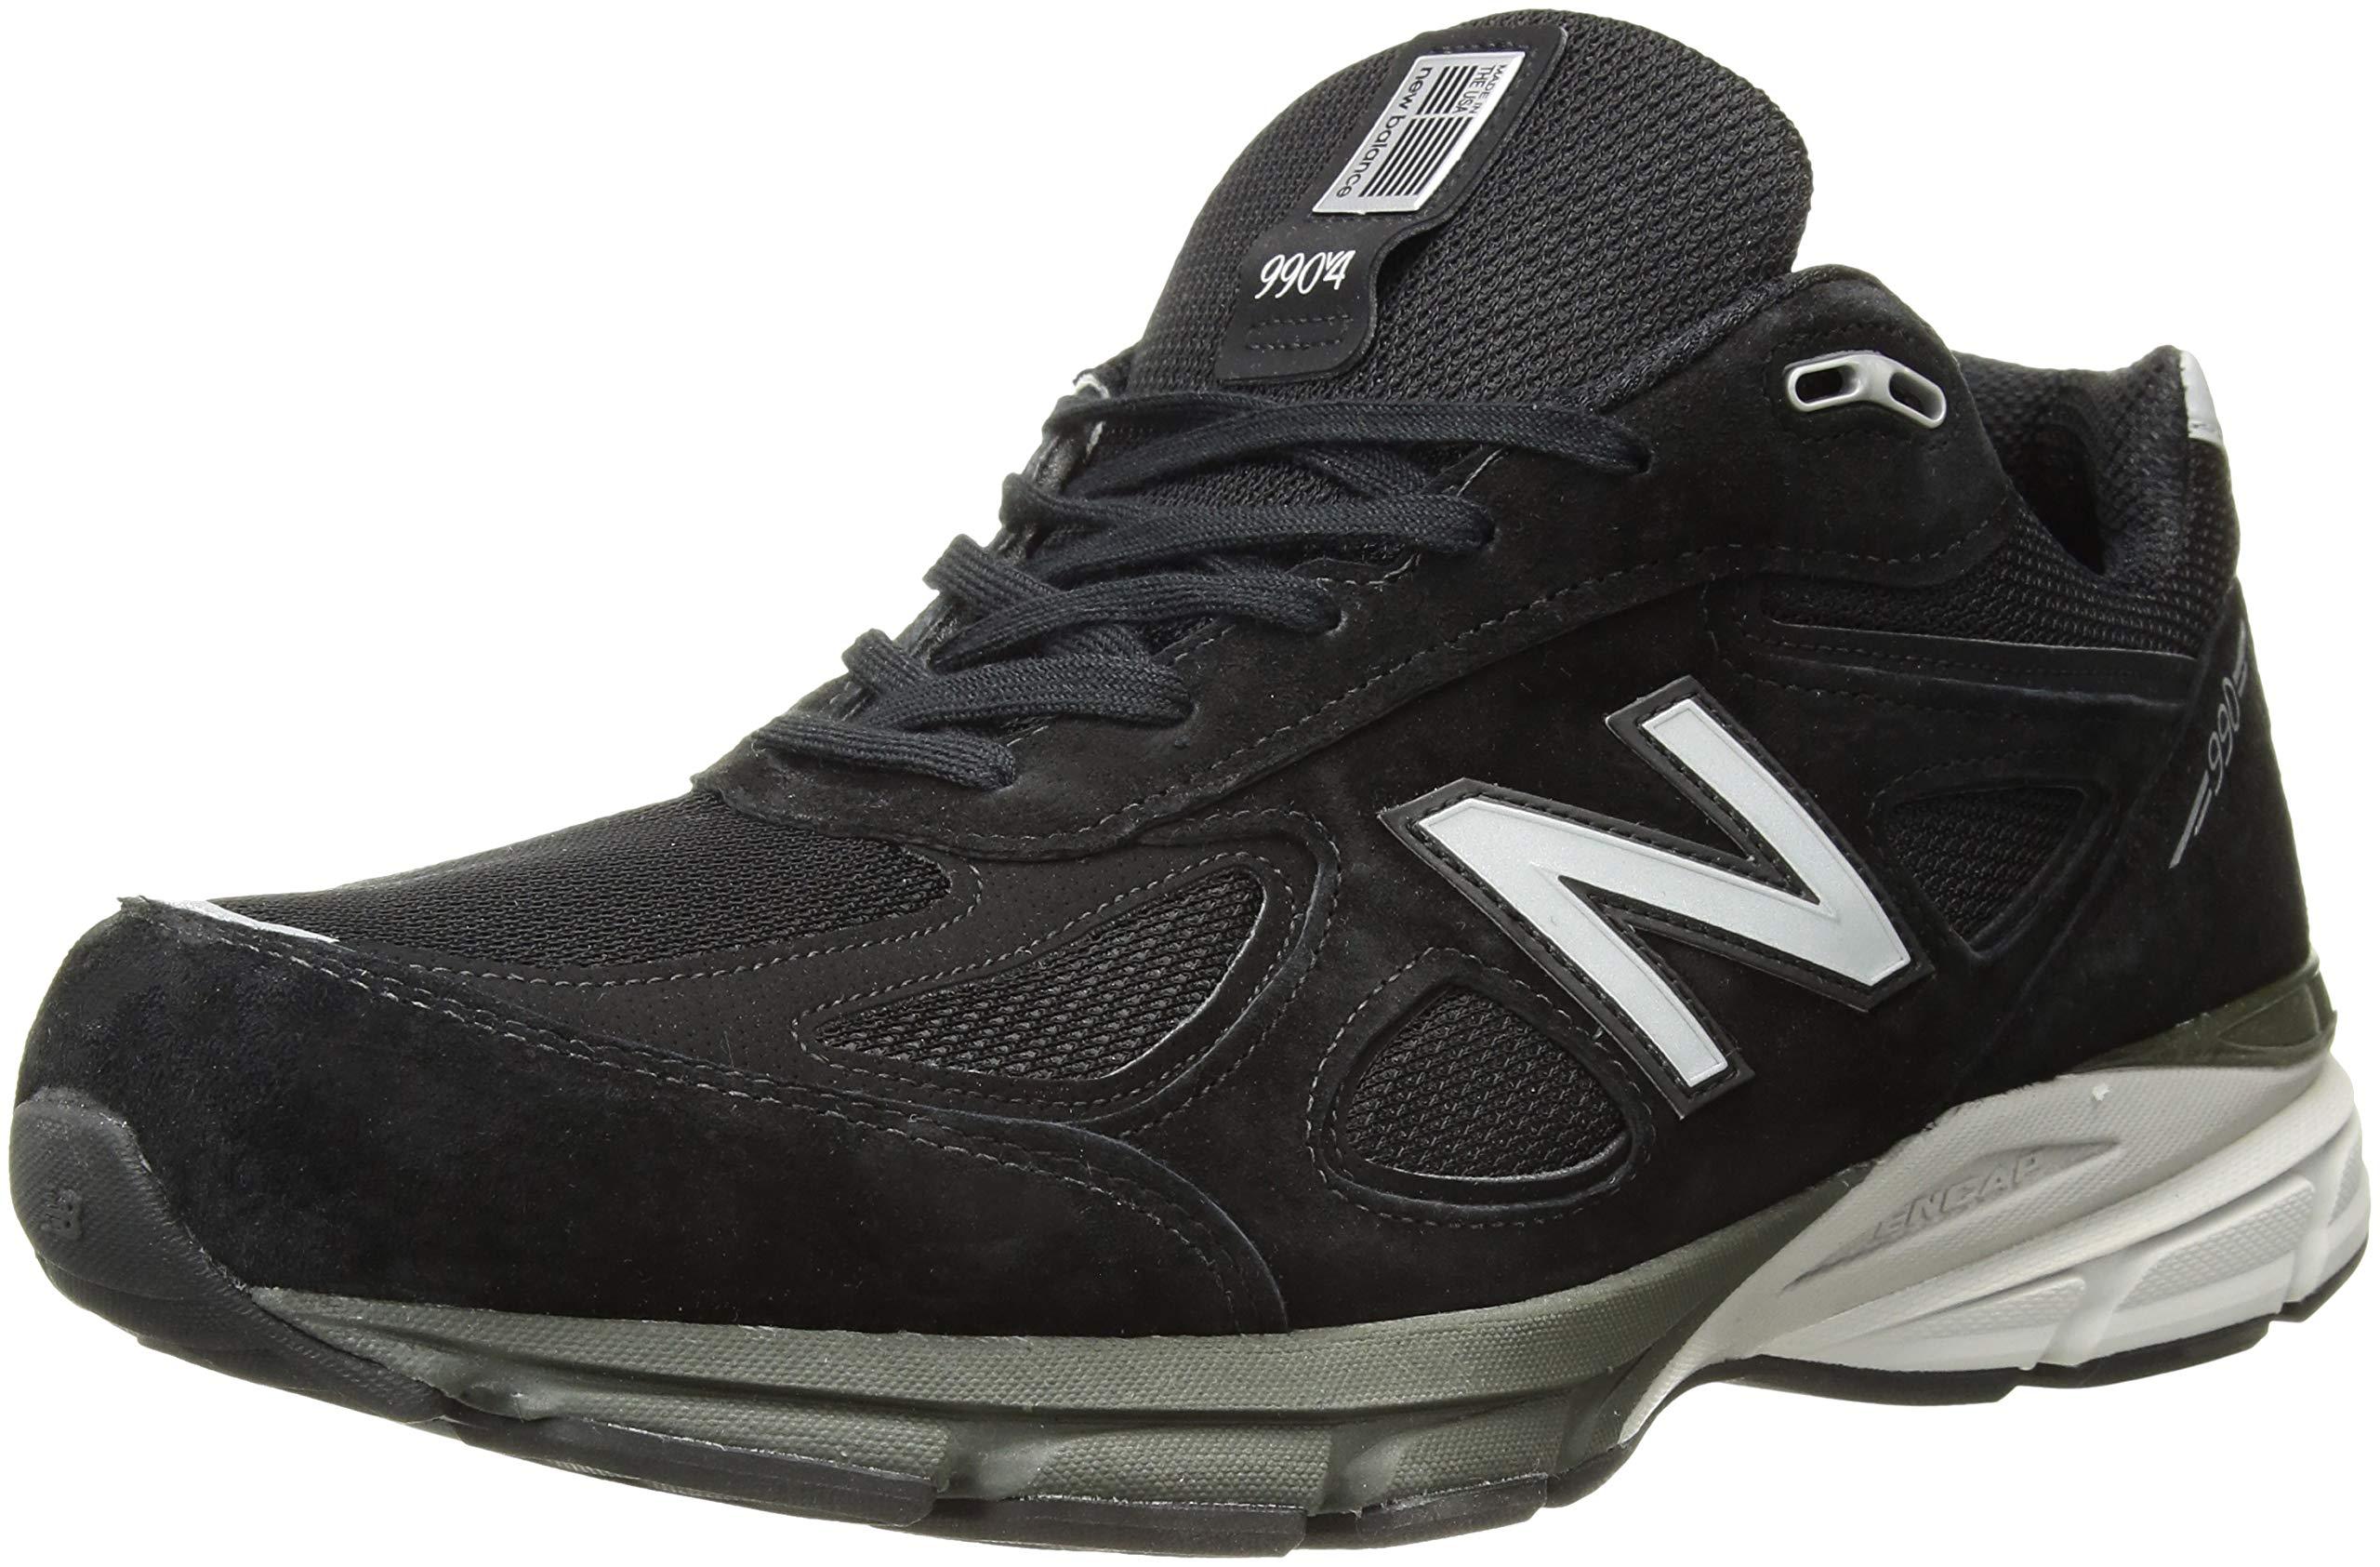 81x1HzXadlL - New Balance Mens M990 990v4 Black Size: 7.5 Wide